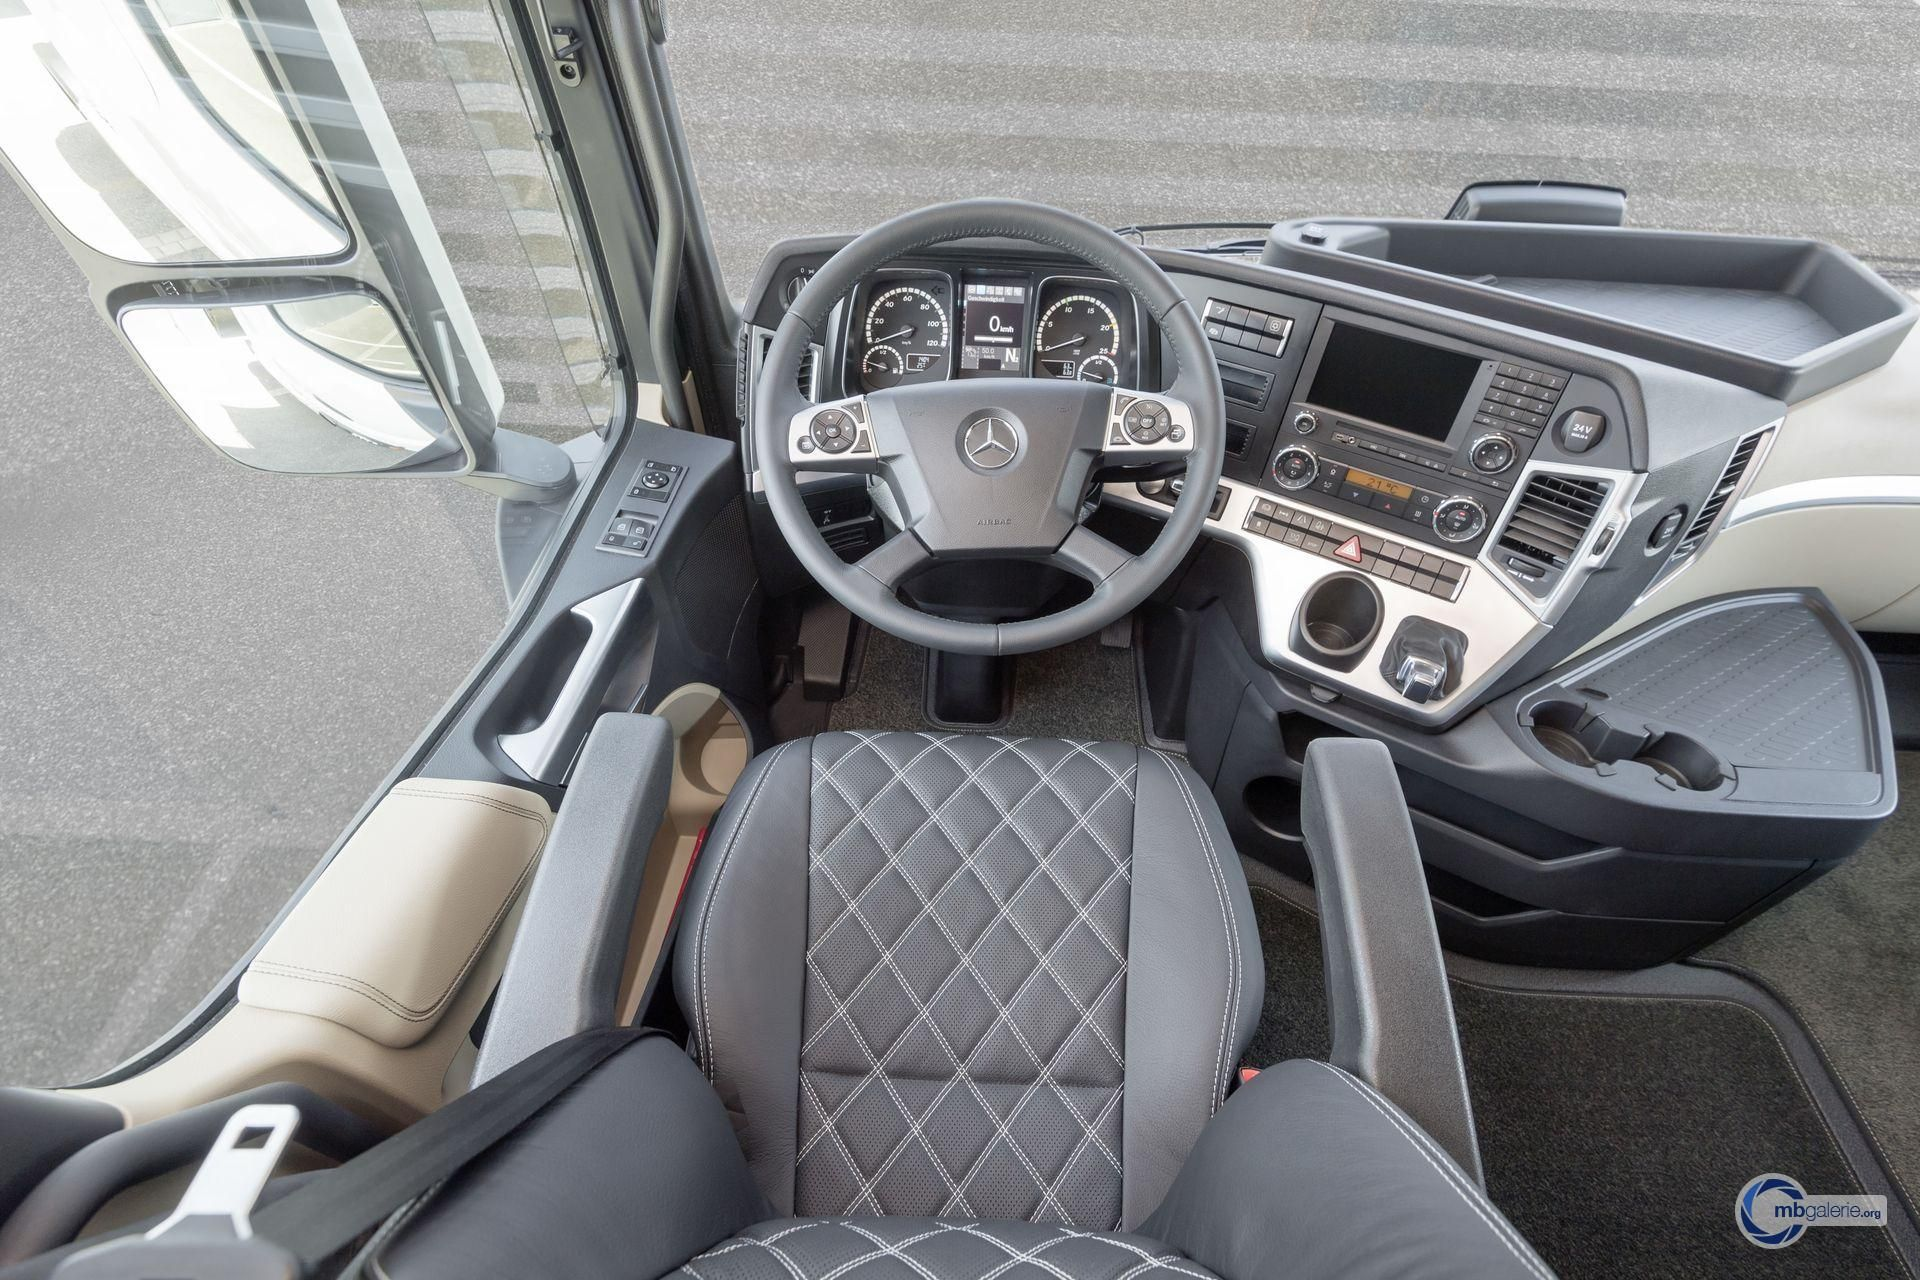 ♥♢♥ Mercedes-Benz Nutzfahrzeuge LKW - Actros (MP4) - mbGalerie on mercedes benz lot, mercedes benz car, mercedes benz amg, mercedes benz lorry, mercedes benz truck, mercedes benz lsi, mercedes benz auto, mercedes benz loo, mercedes benz camion, mercedes benz traktor, mercedes benz log, mercedes benz lic, mercedes benz lim,